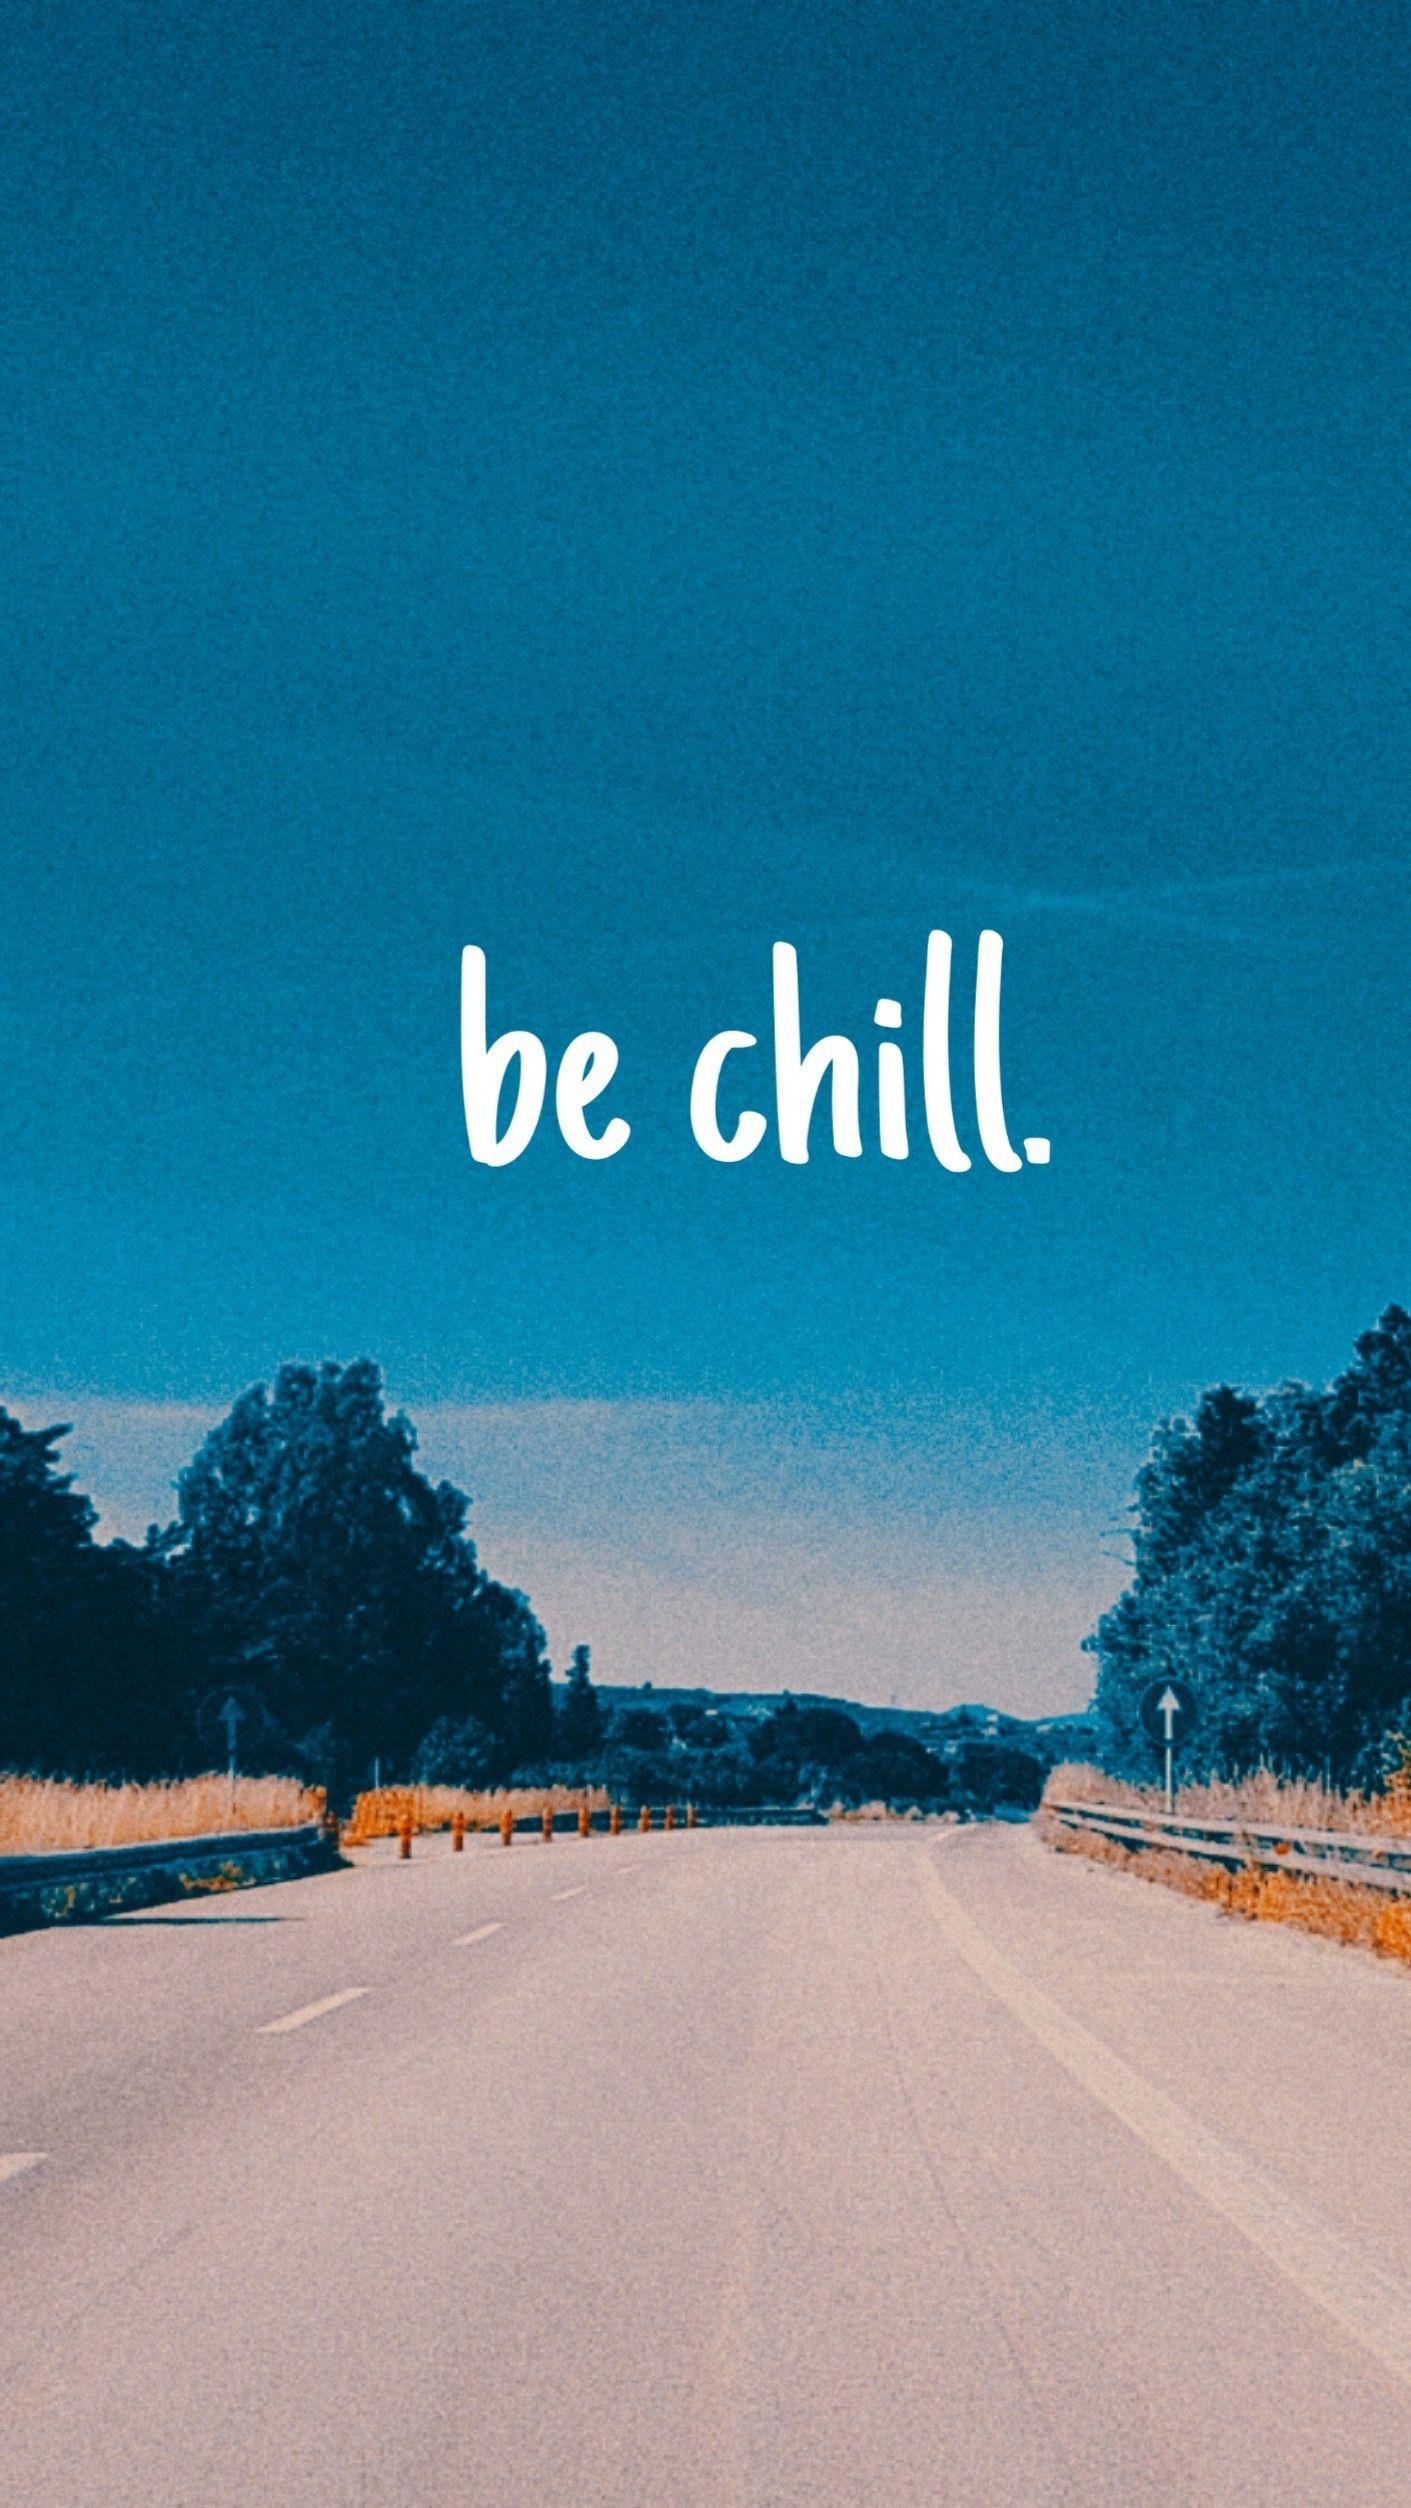 Be Chill Wallpaper Chill Wallpaper Blue Aesthetic Pastel Light Blue Aesthetic